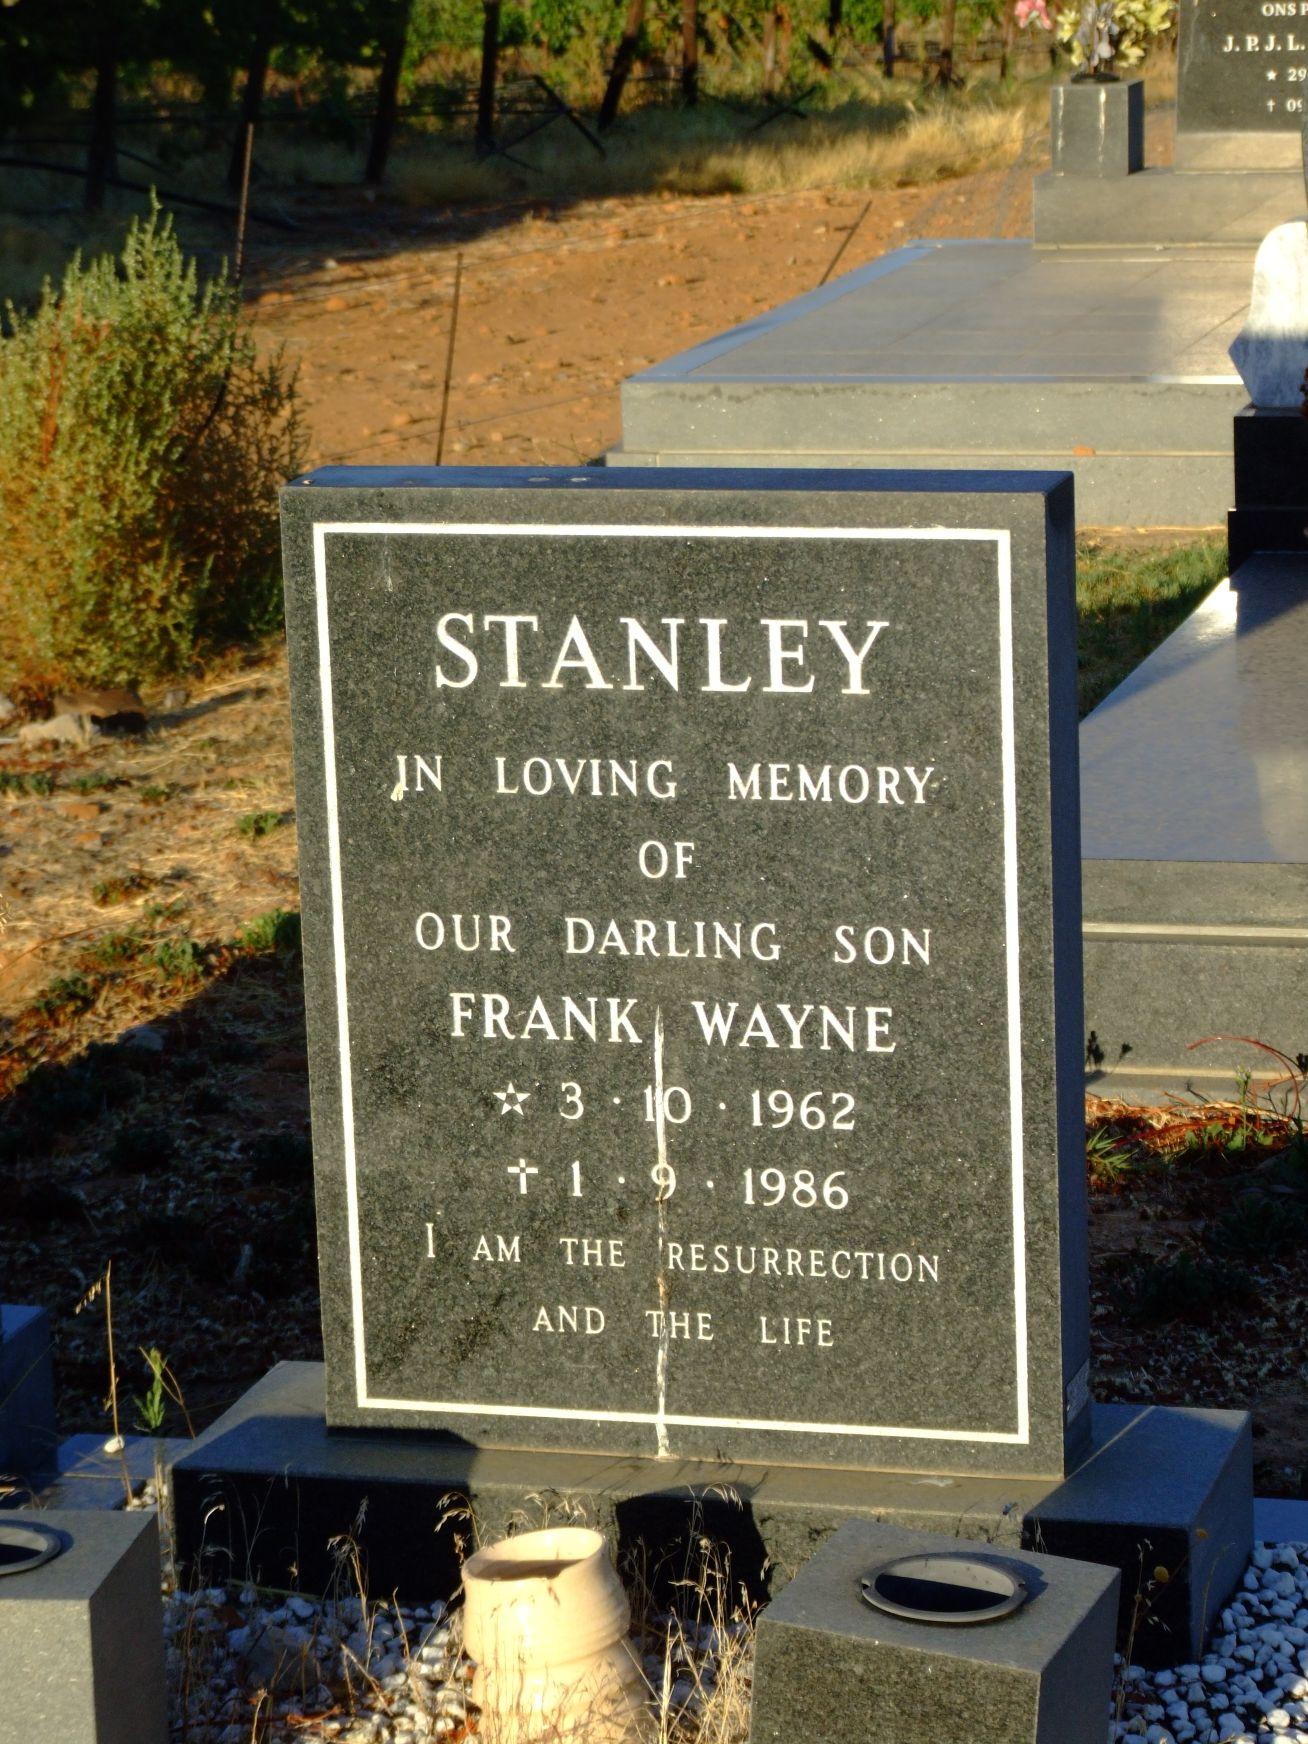 Stanley, Frank Wayne